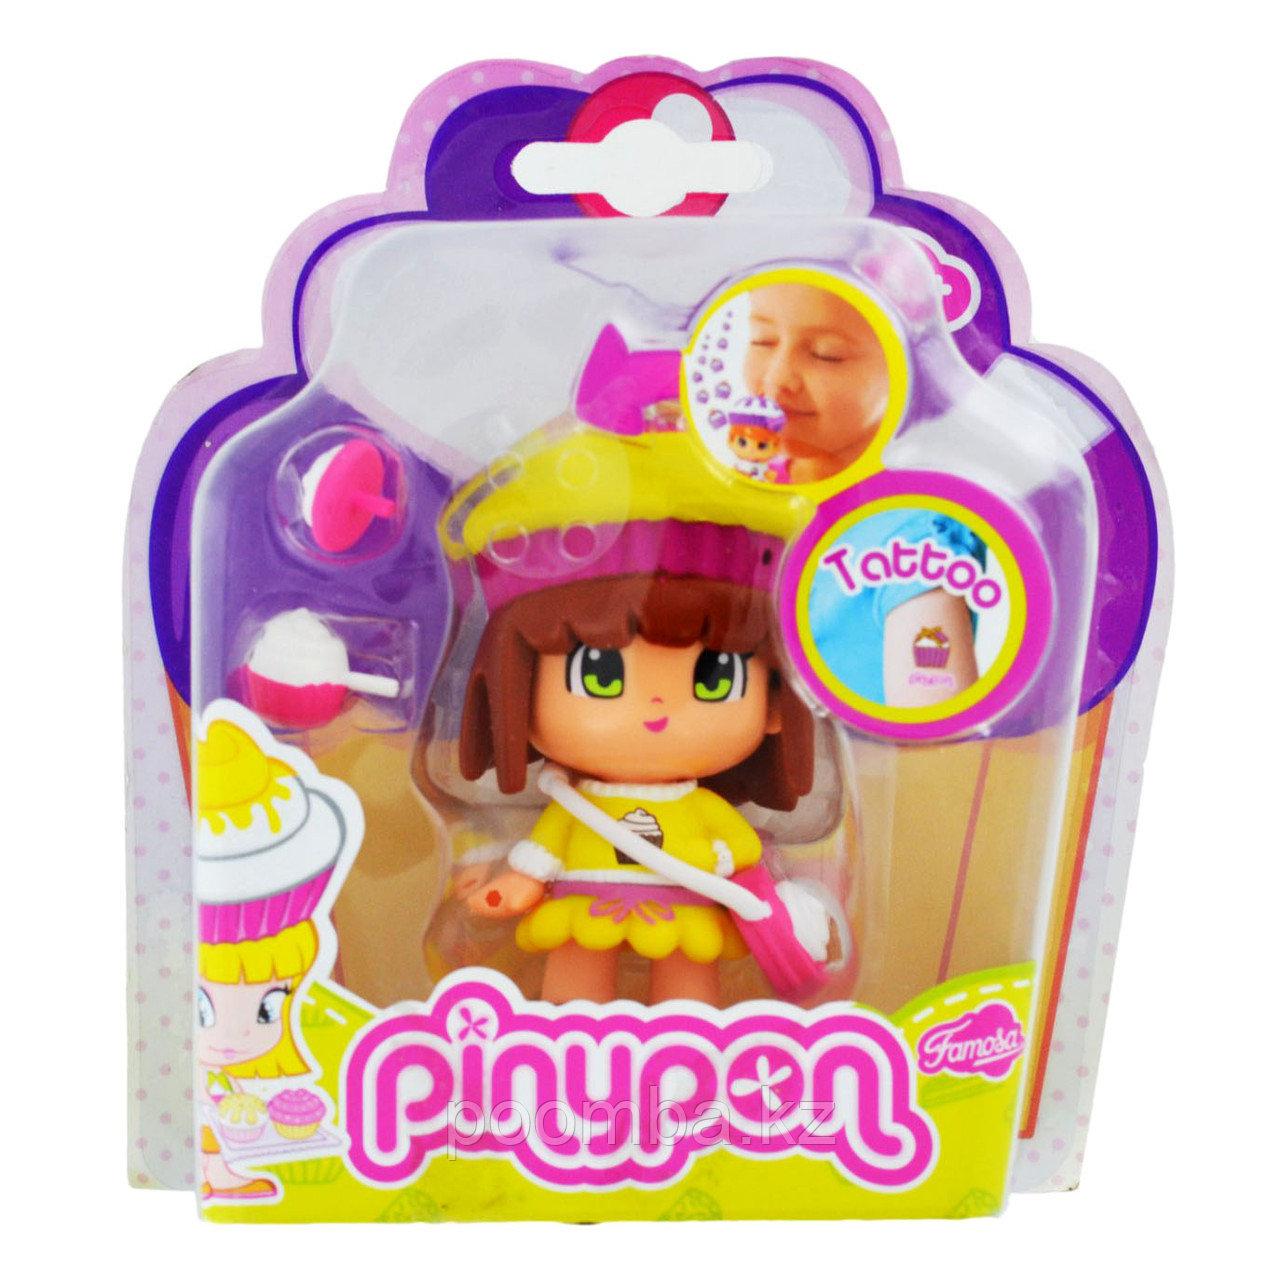 Куколка Пинипон с ароматом Пирожного